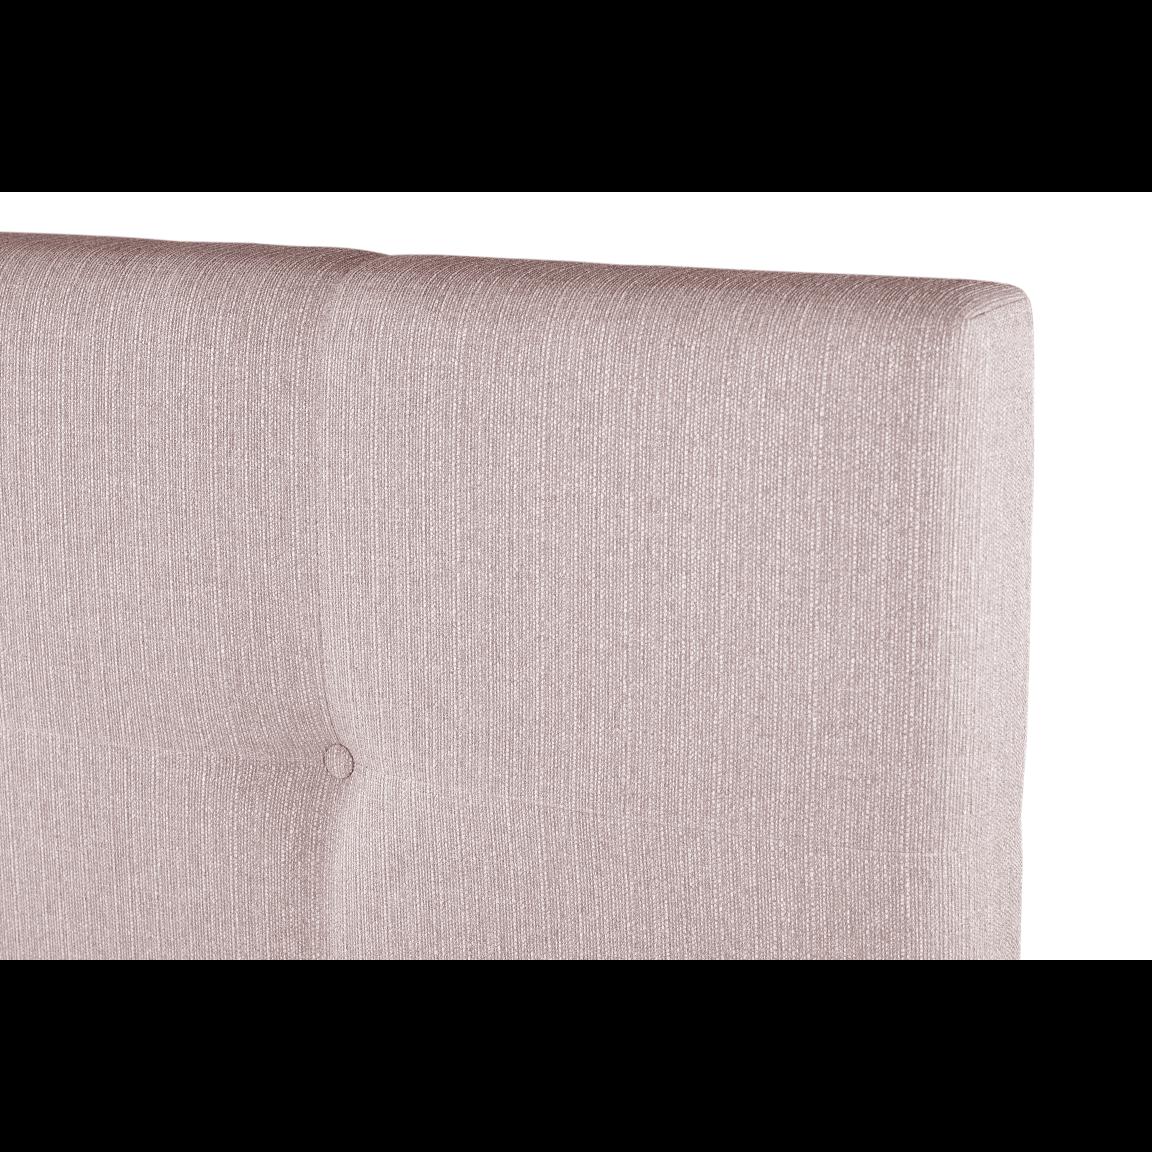 Gepolstertes Bett Cobalt   Rosa-140 x 200 cm